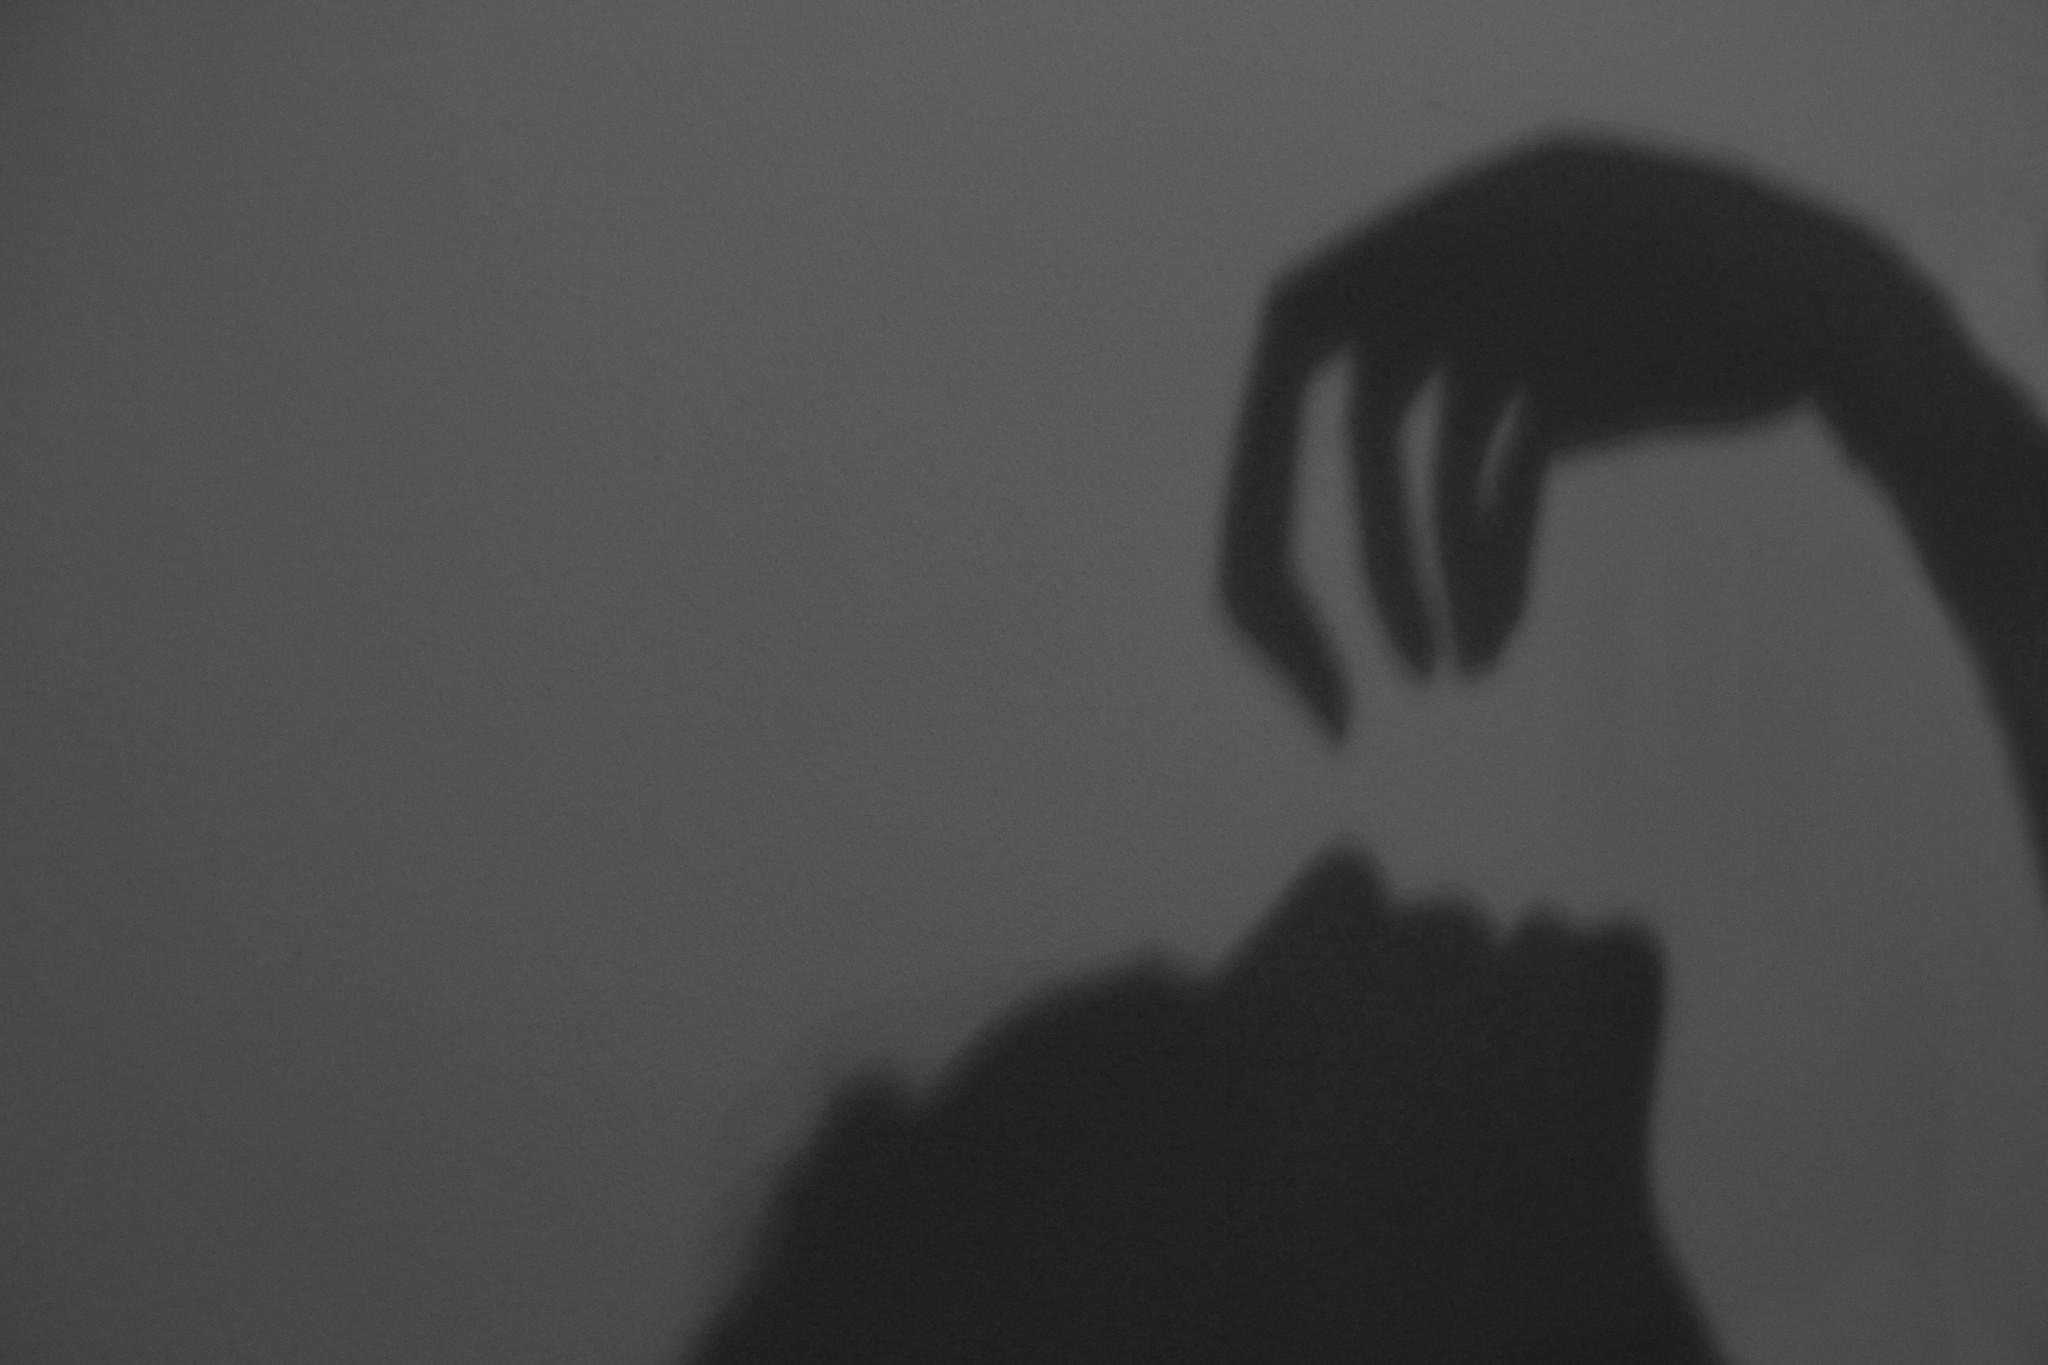 Waking Paralysed: Abduction or sleep paralysis?